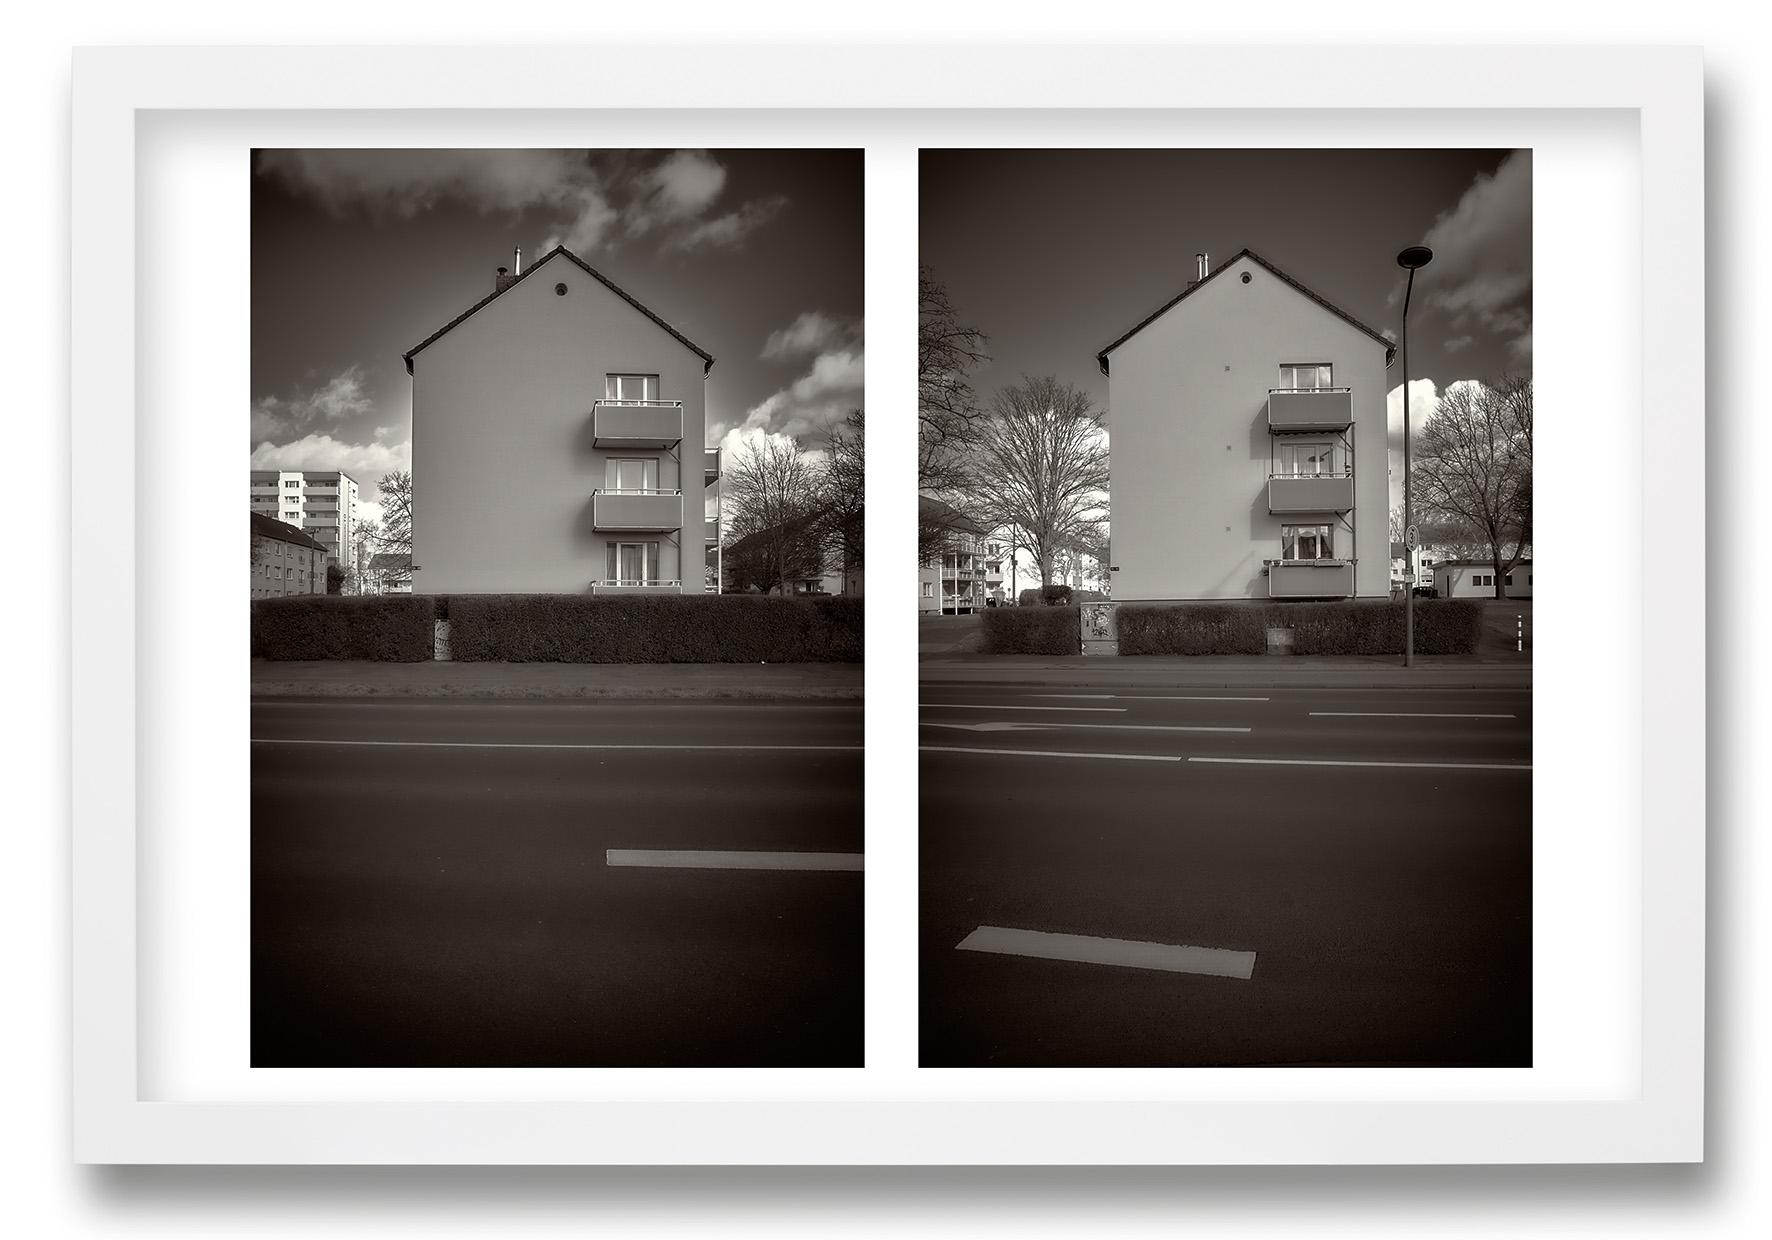 Rahmen_weiss_Test_2er_Rheinufer_5